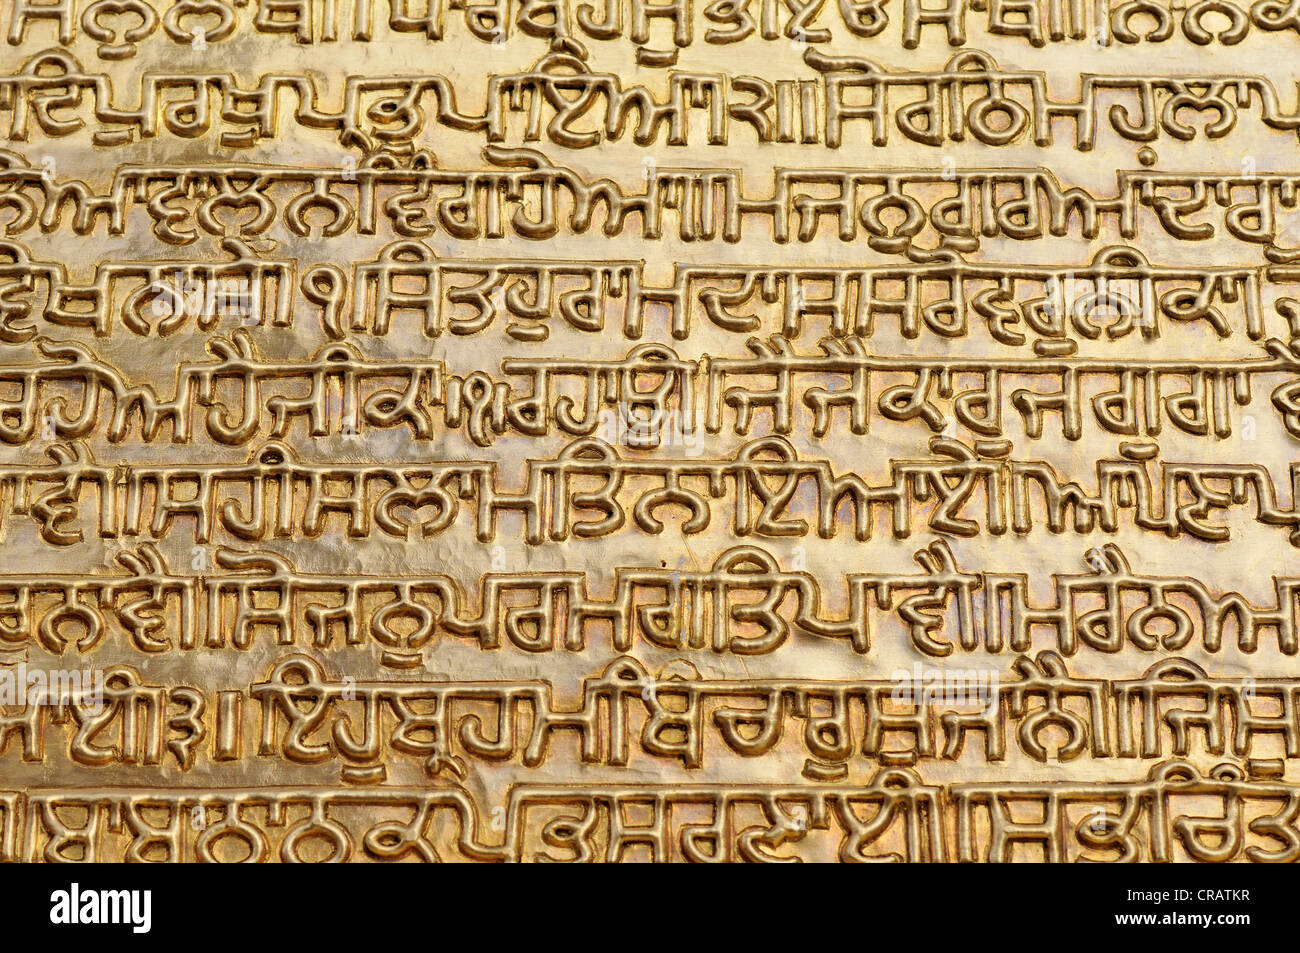 Gilt text from the Granth Sahib, the holy book of Sikhs, Harmandir Sahib or Golden Temple, Amritsar, Punjab, North - Stock Image